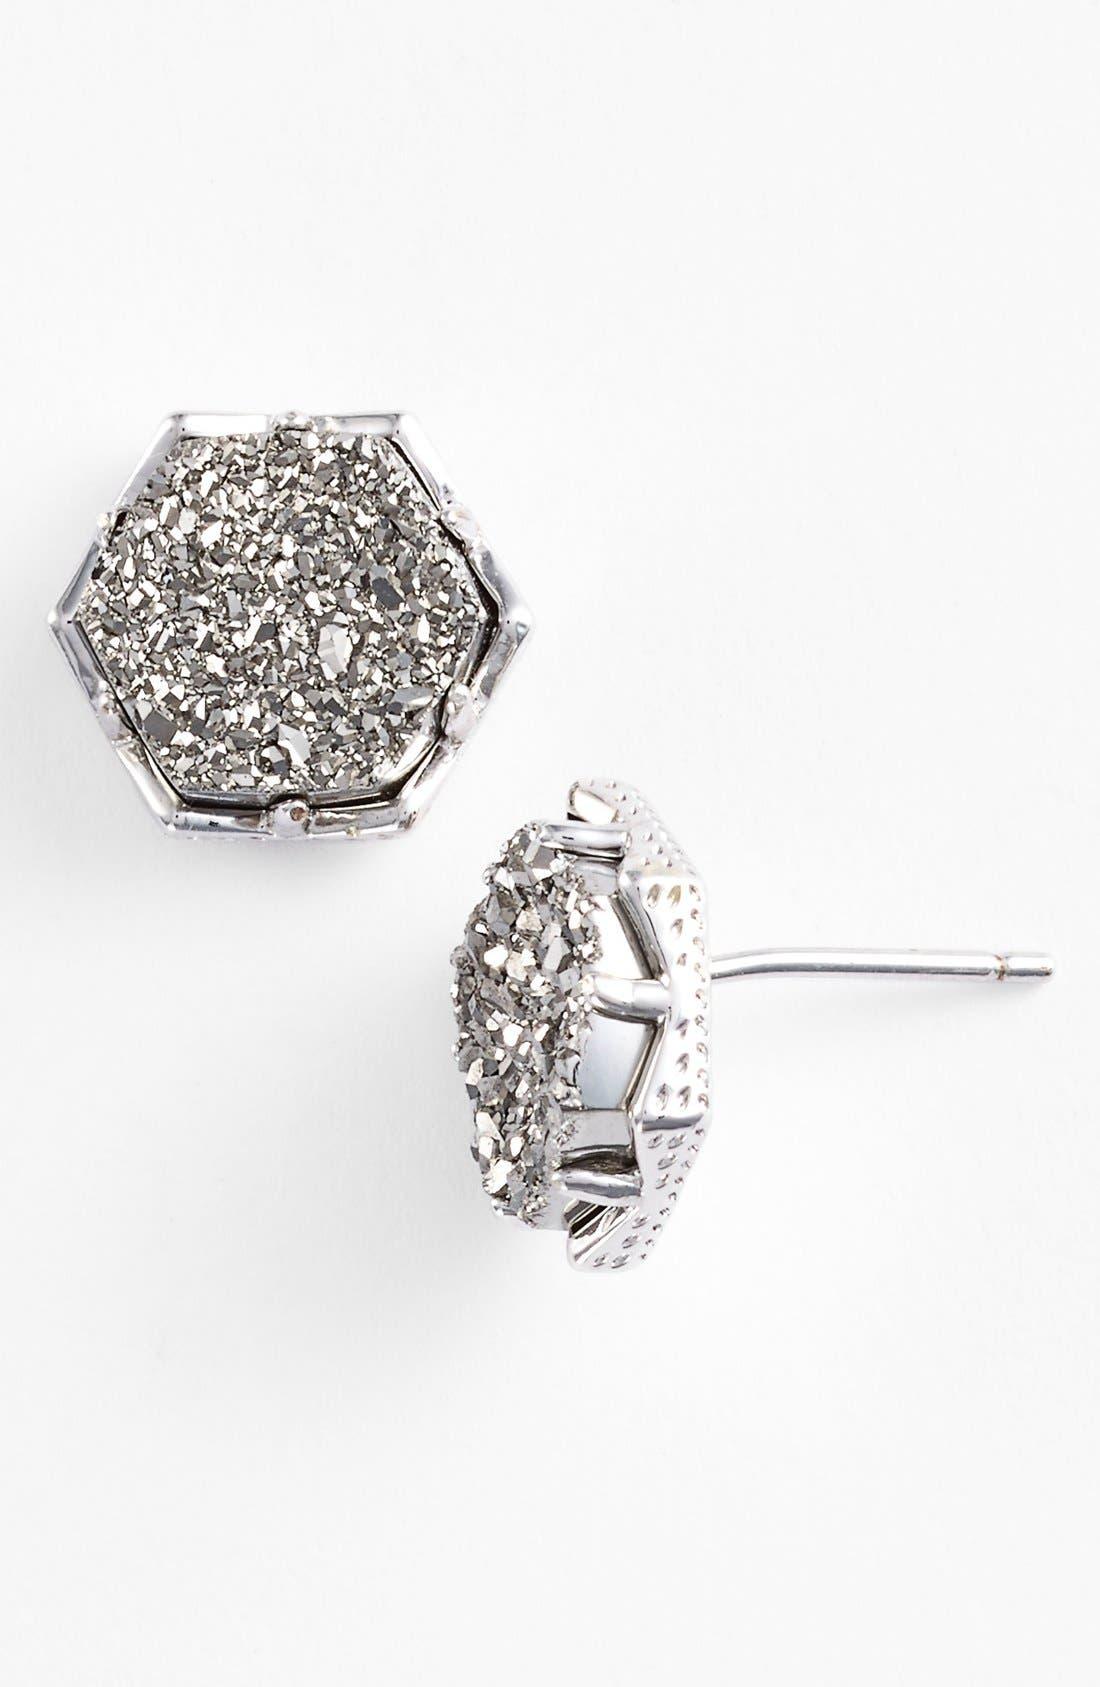 Alternate Image 1 Selected - Kendra Scott 'Macy' Stud Earrings